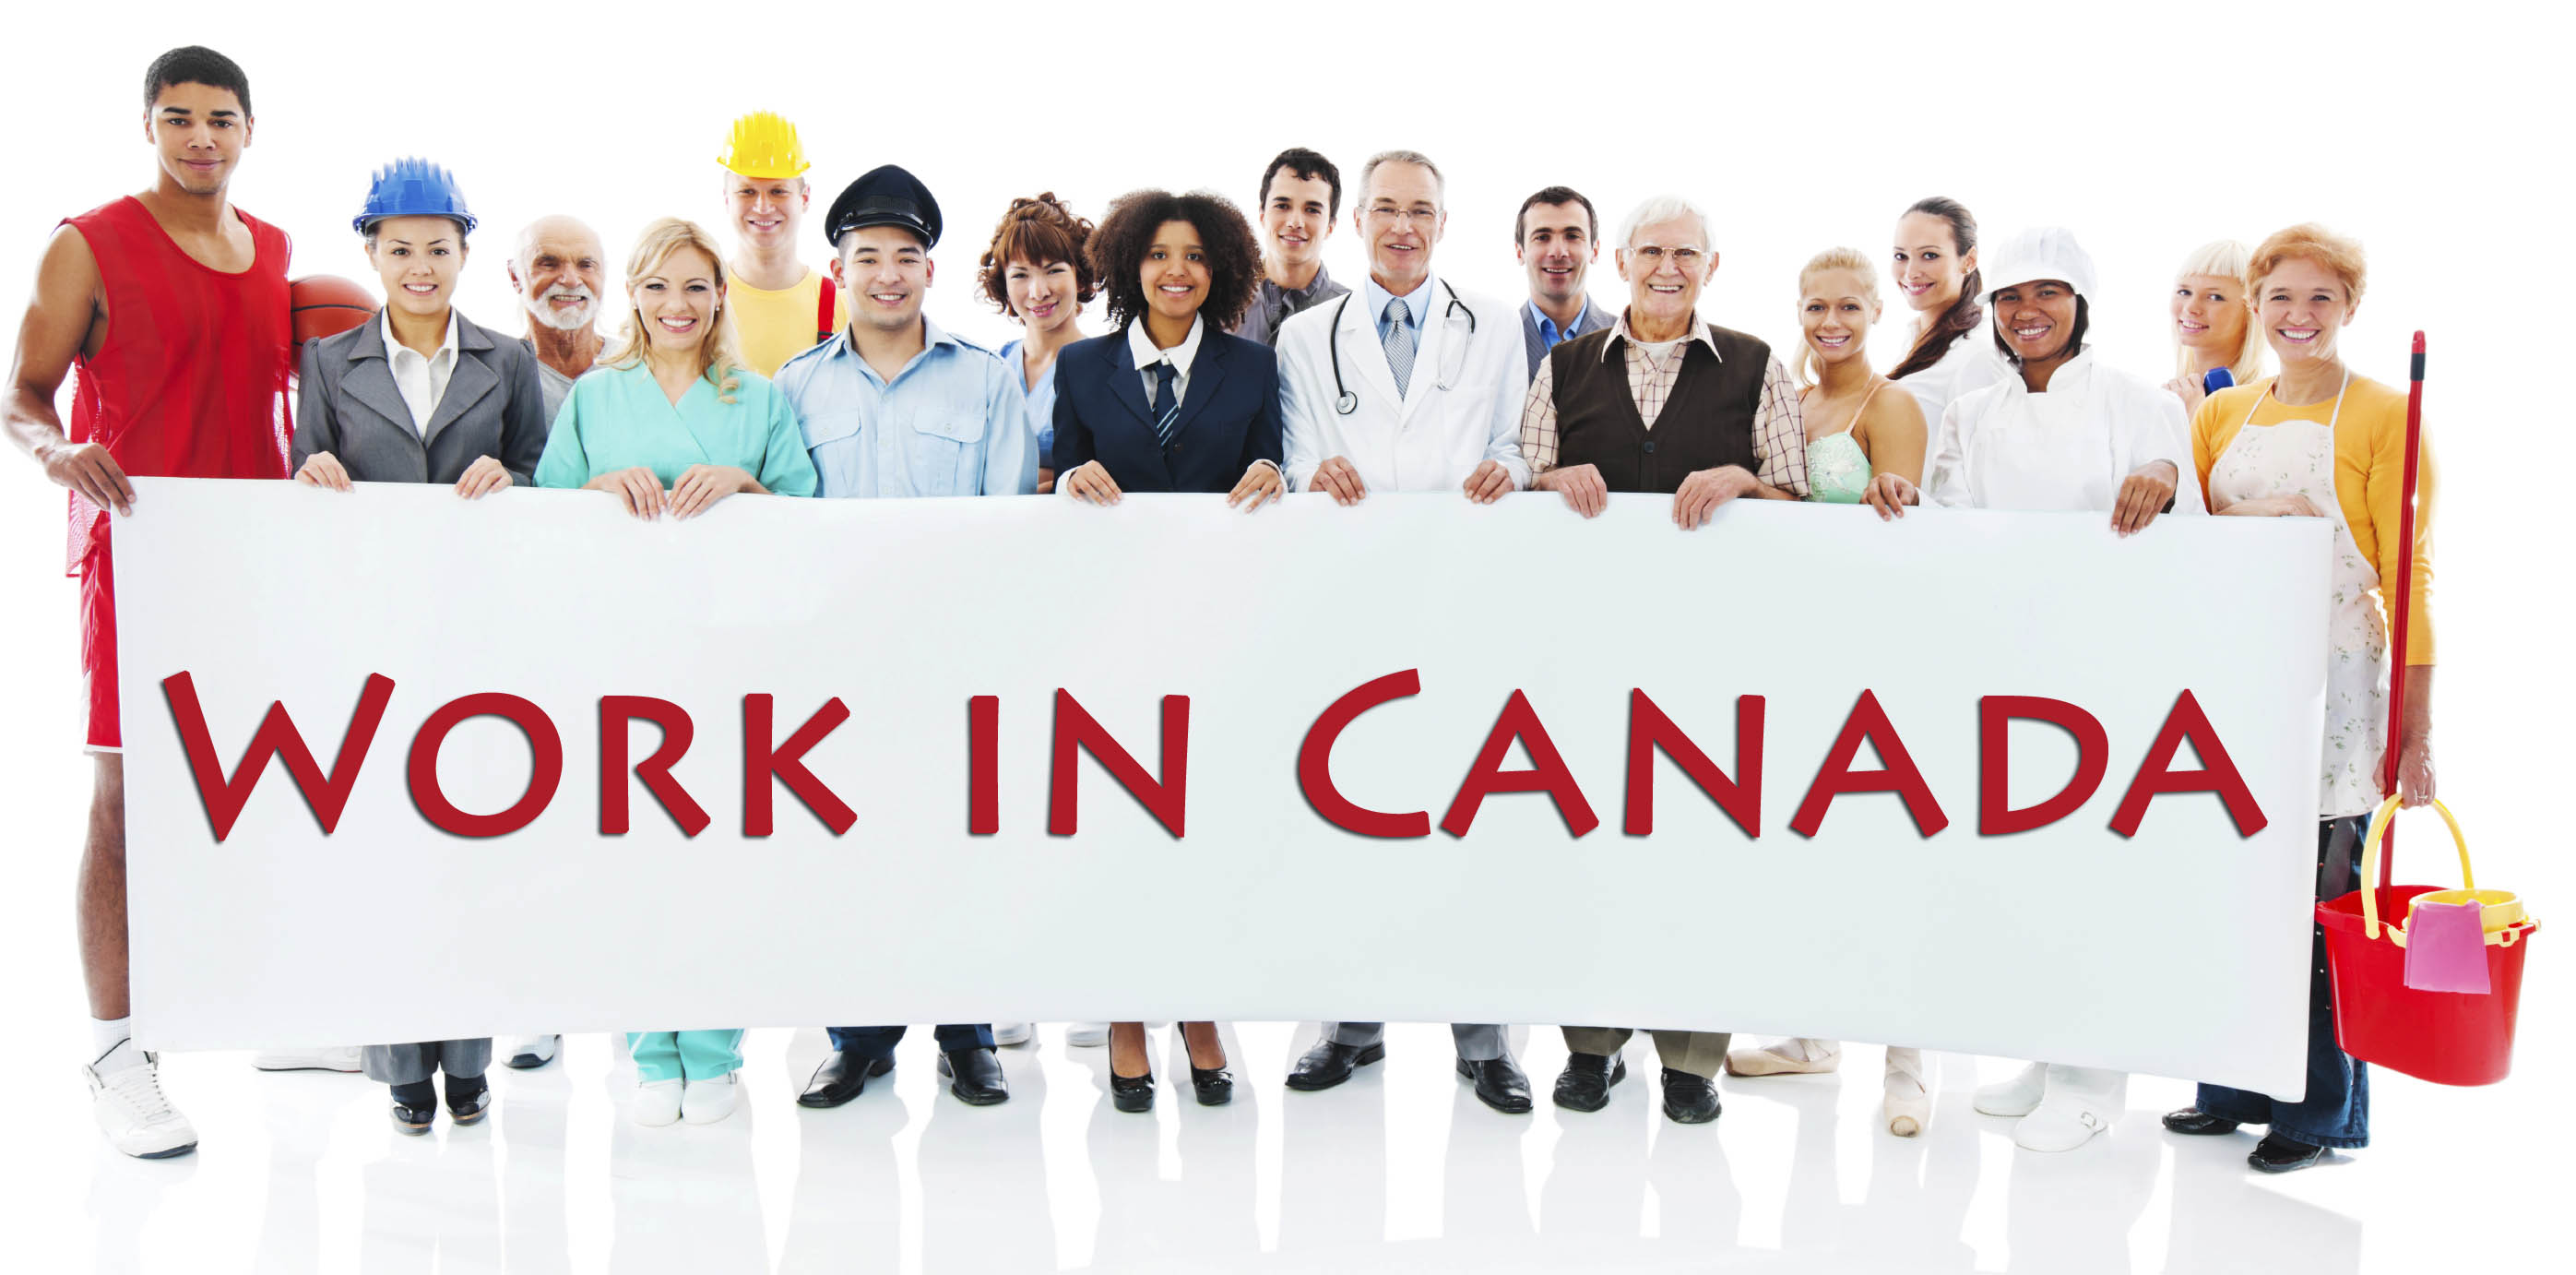 WORK-IN-CANADA-FB-copy  As 10 melhores cidades para se encontrar emprego no Canadá WORK IN CANADA FB copy